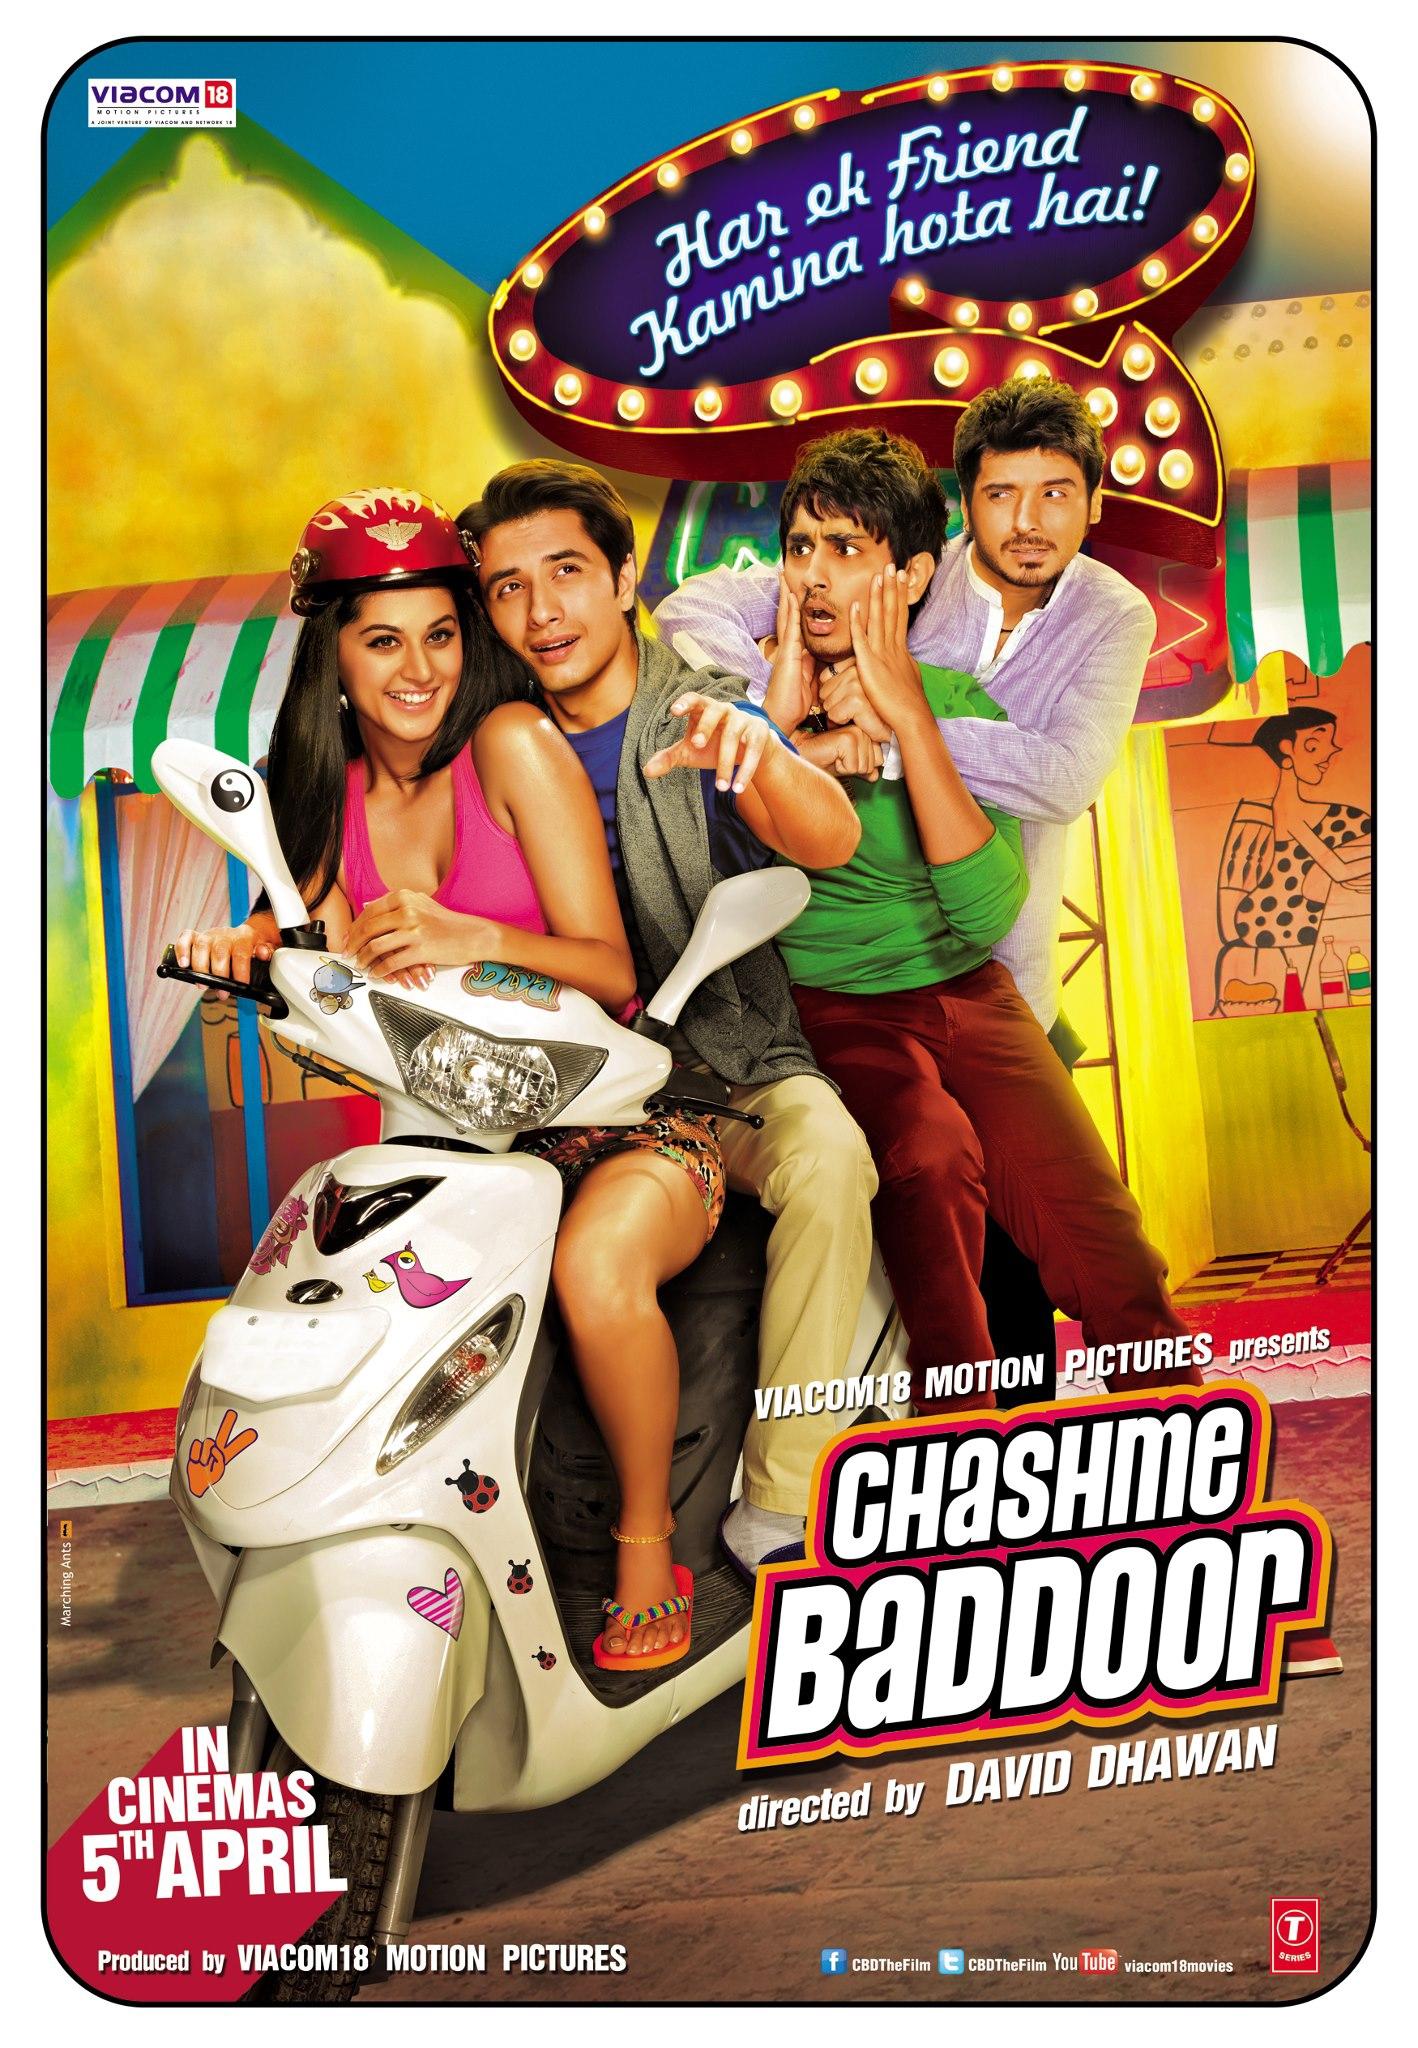 Chashme Baddoor - Movie Poster #1 (Original)